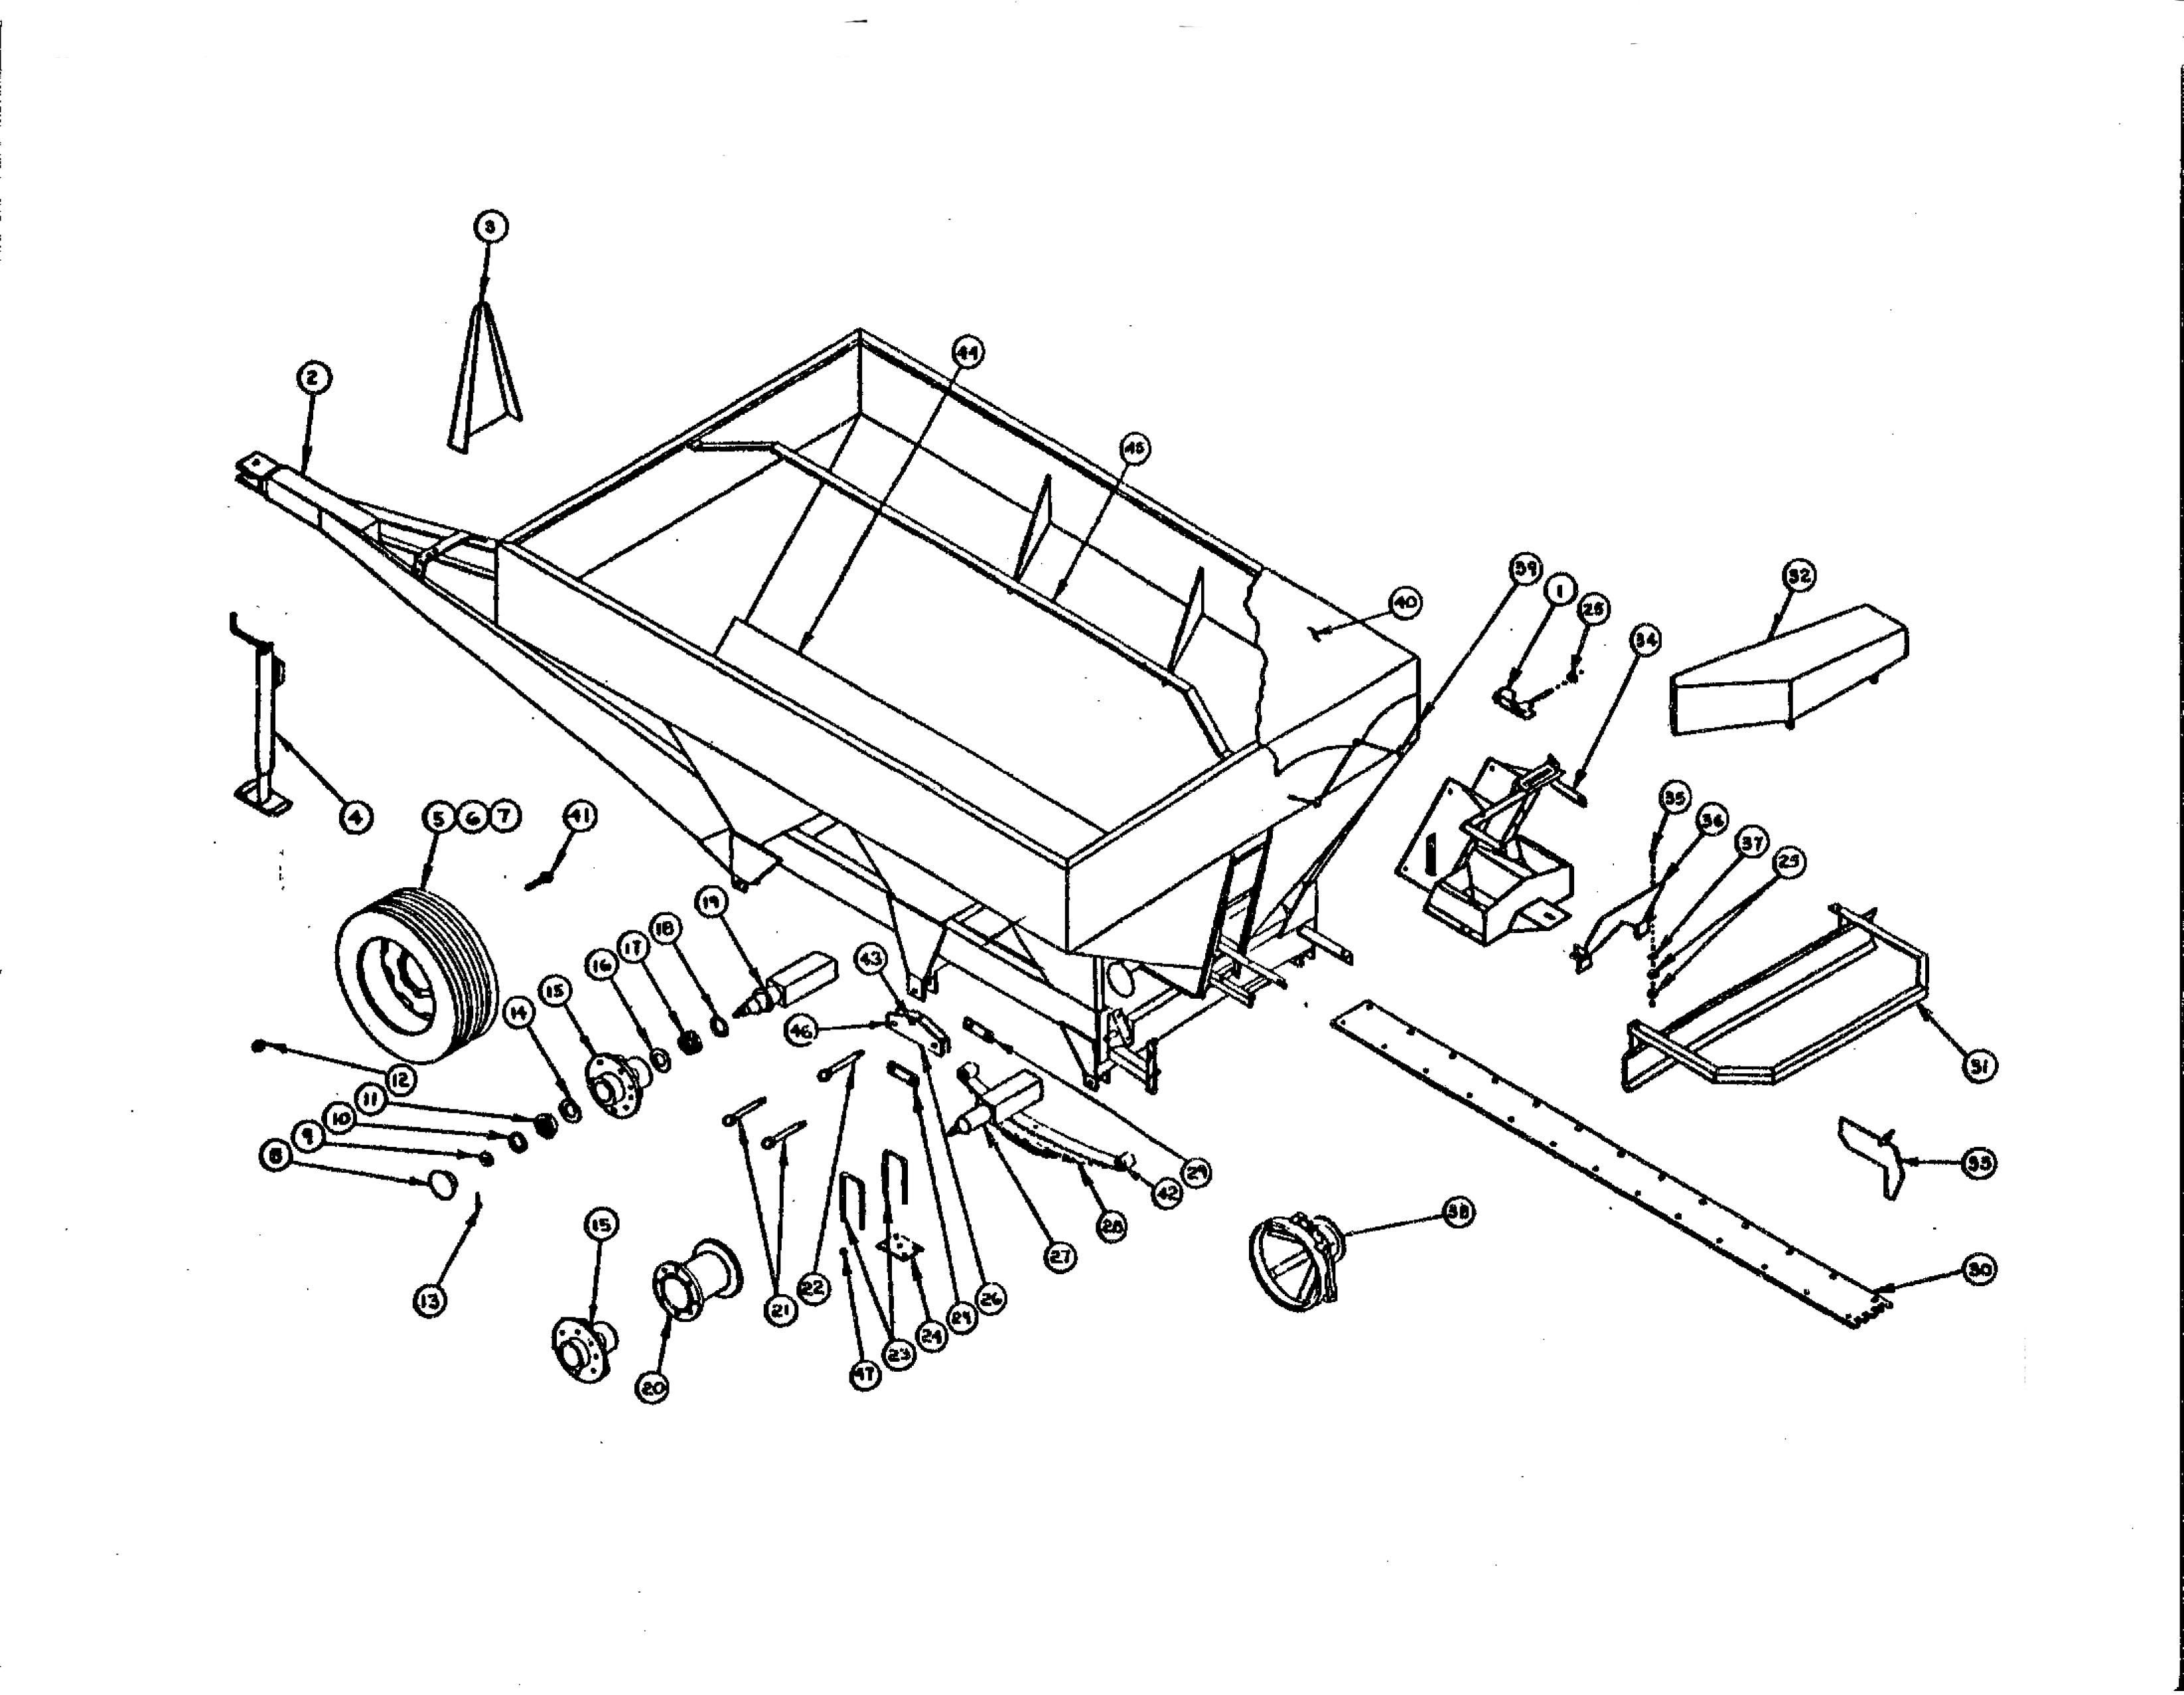 Willmar S600 Hopper Parts